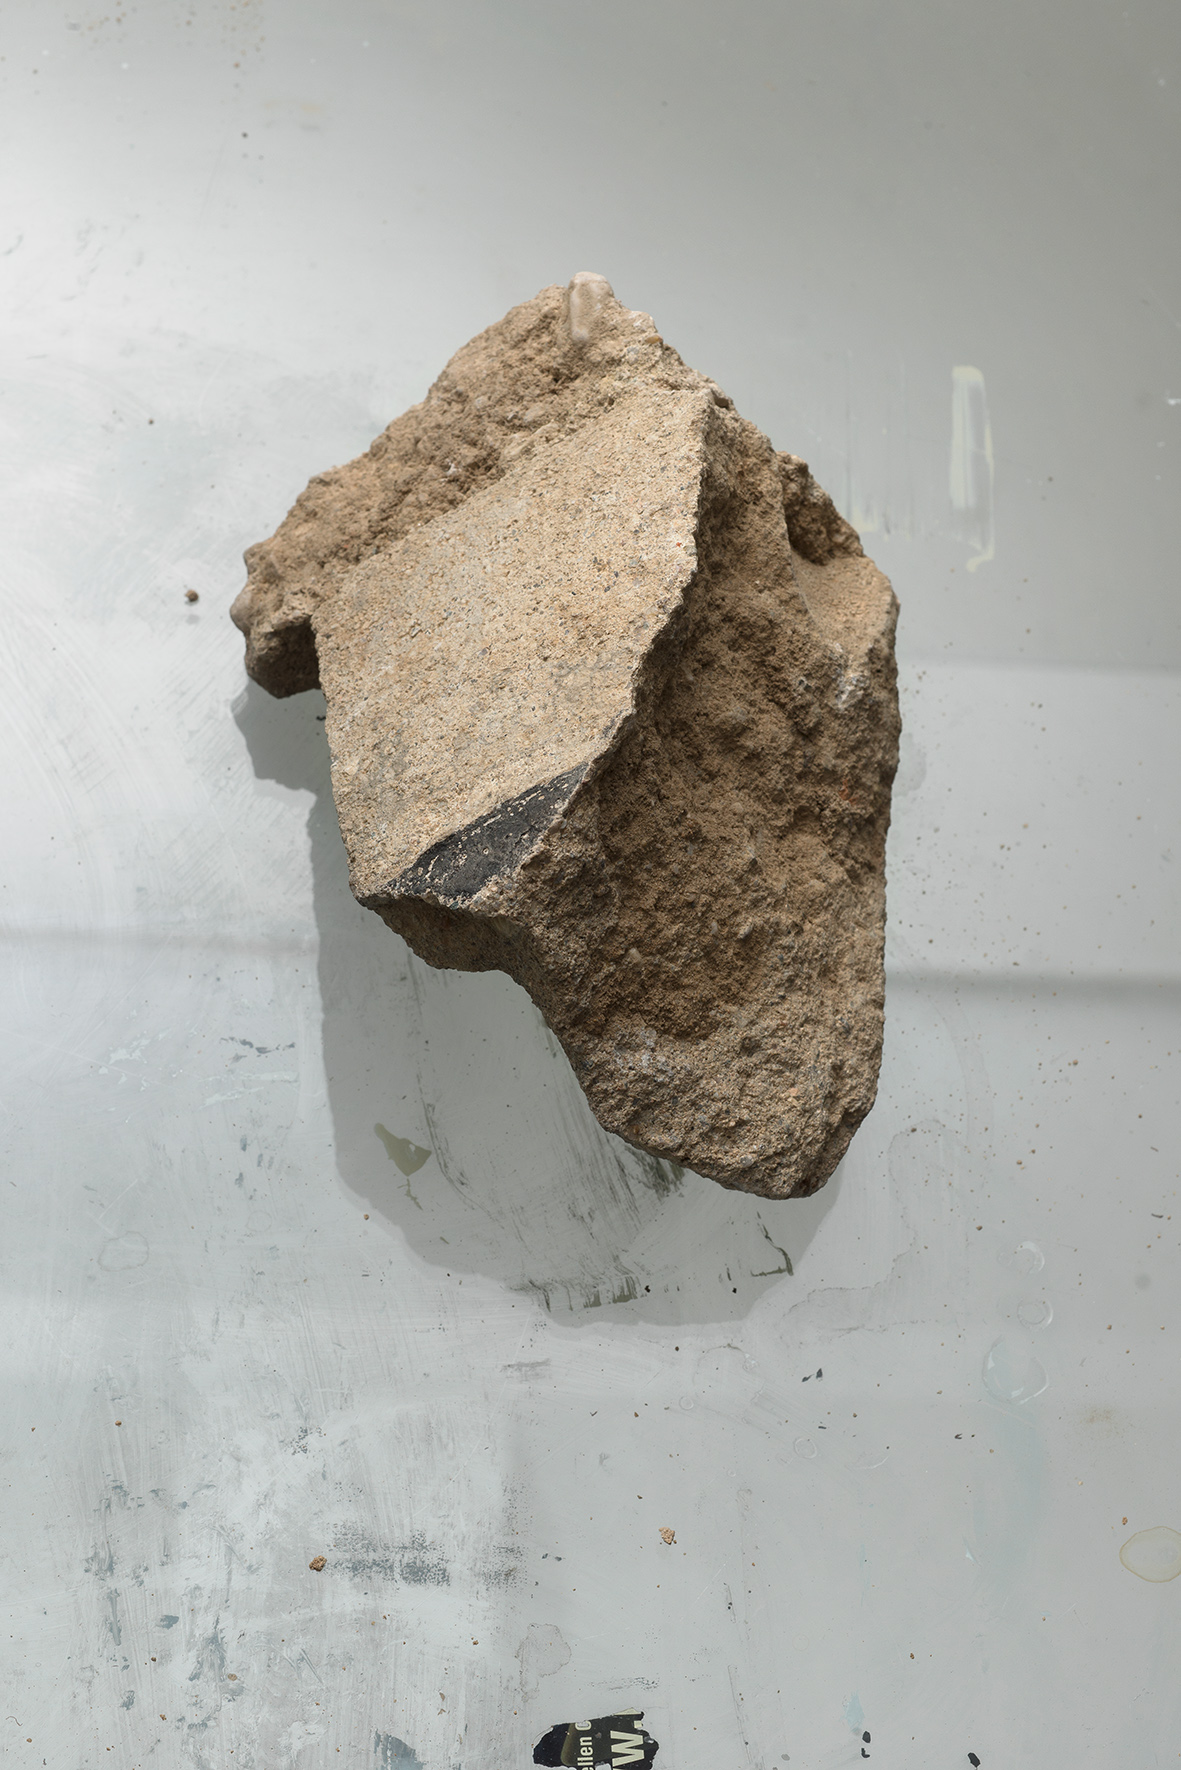 untitled (stone IV), Andrzej Steinbach